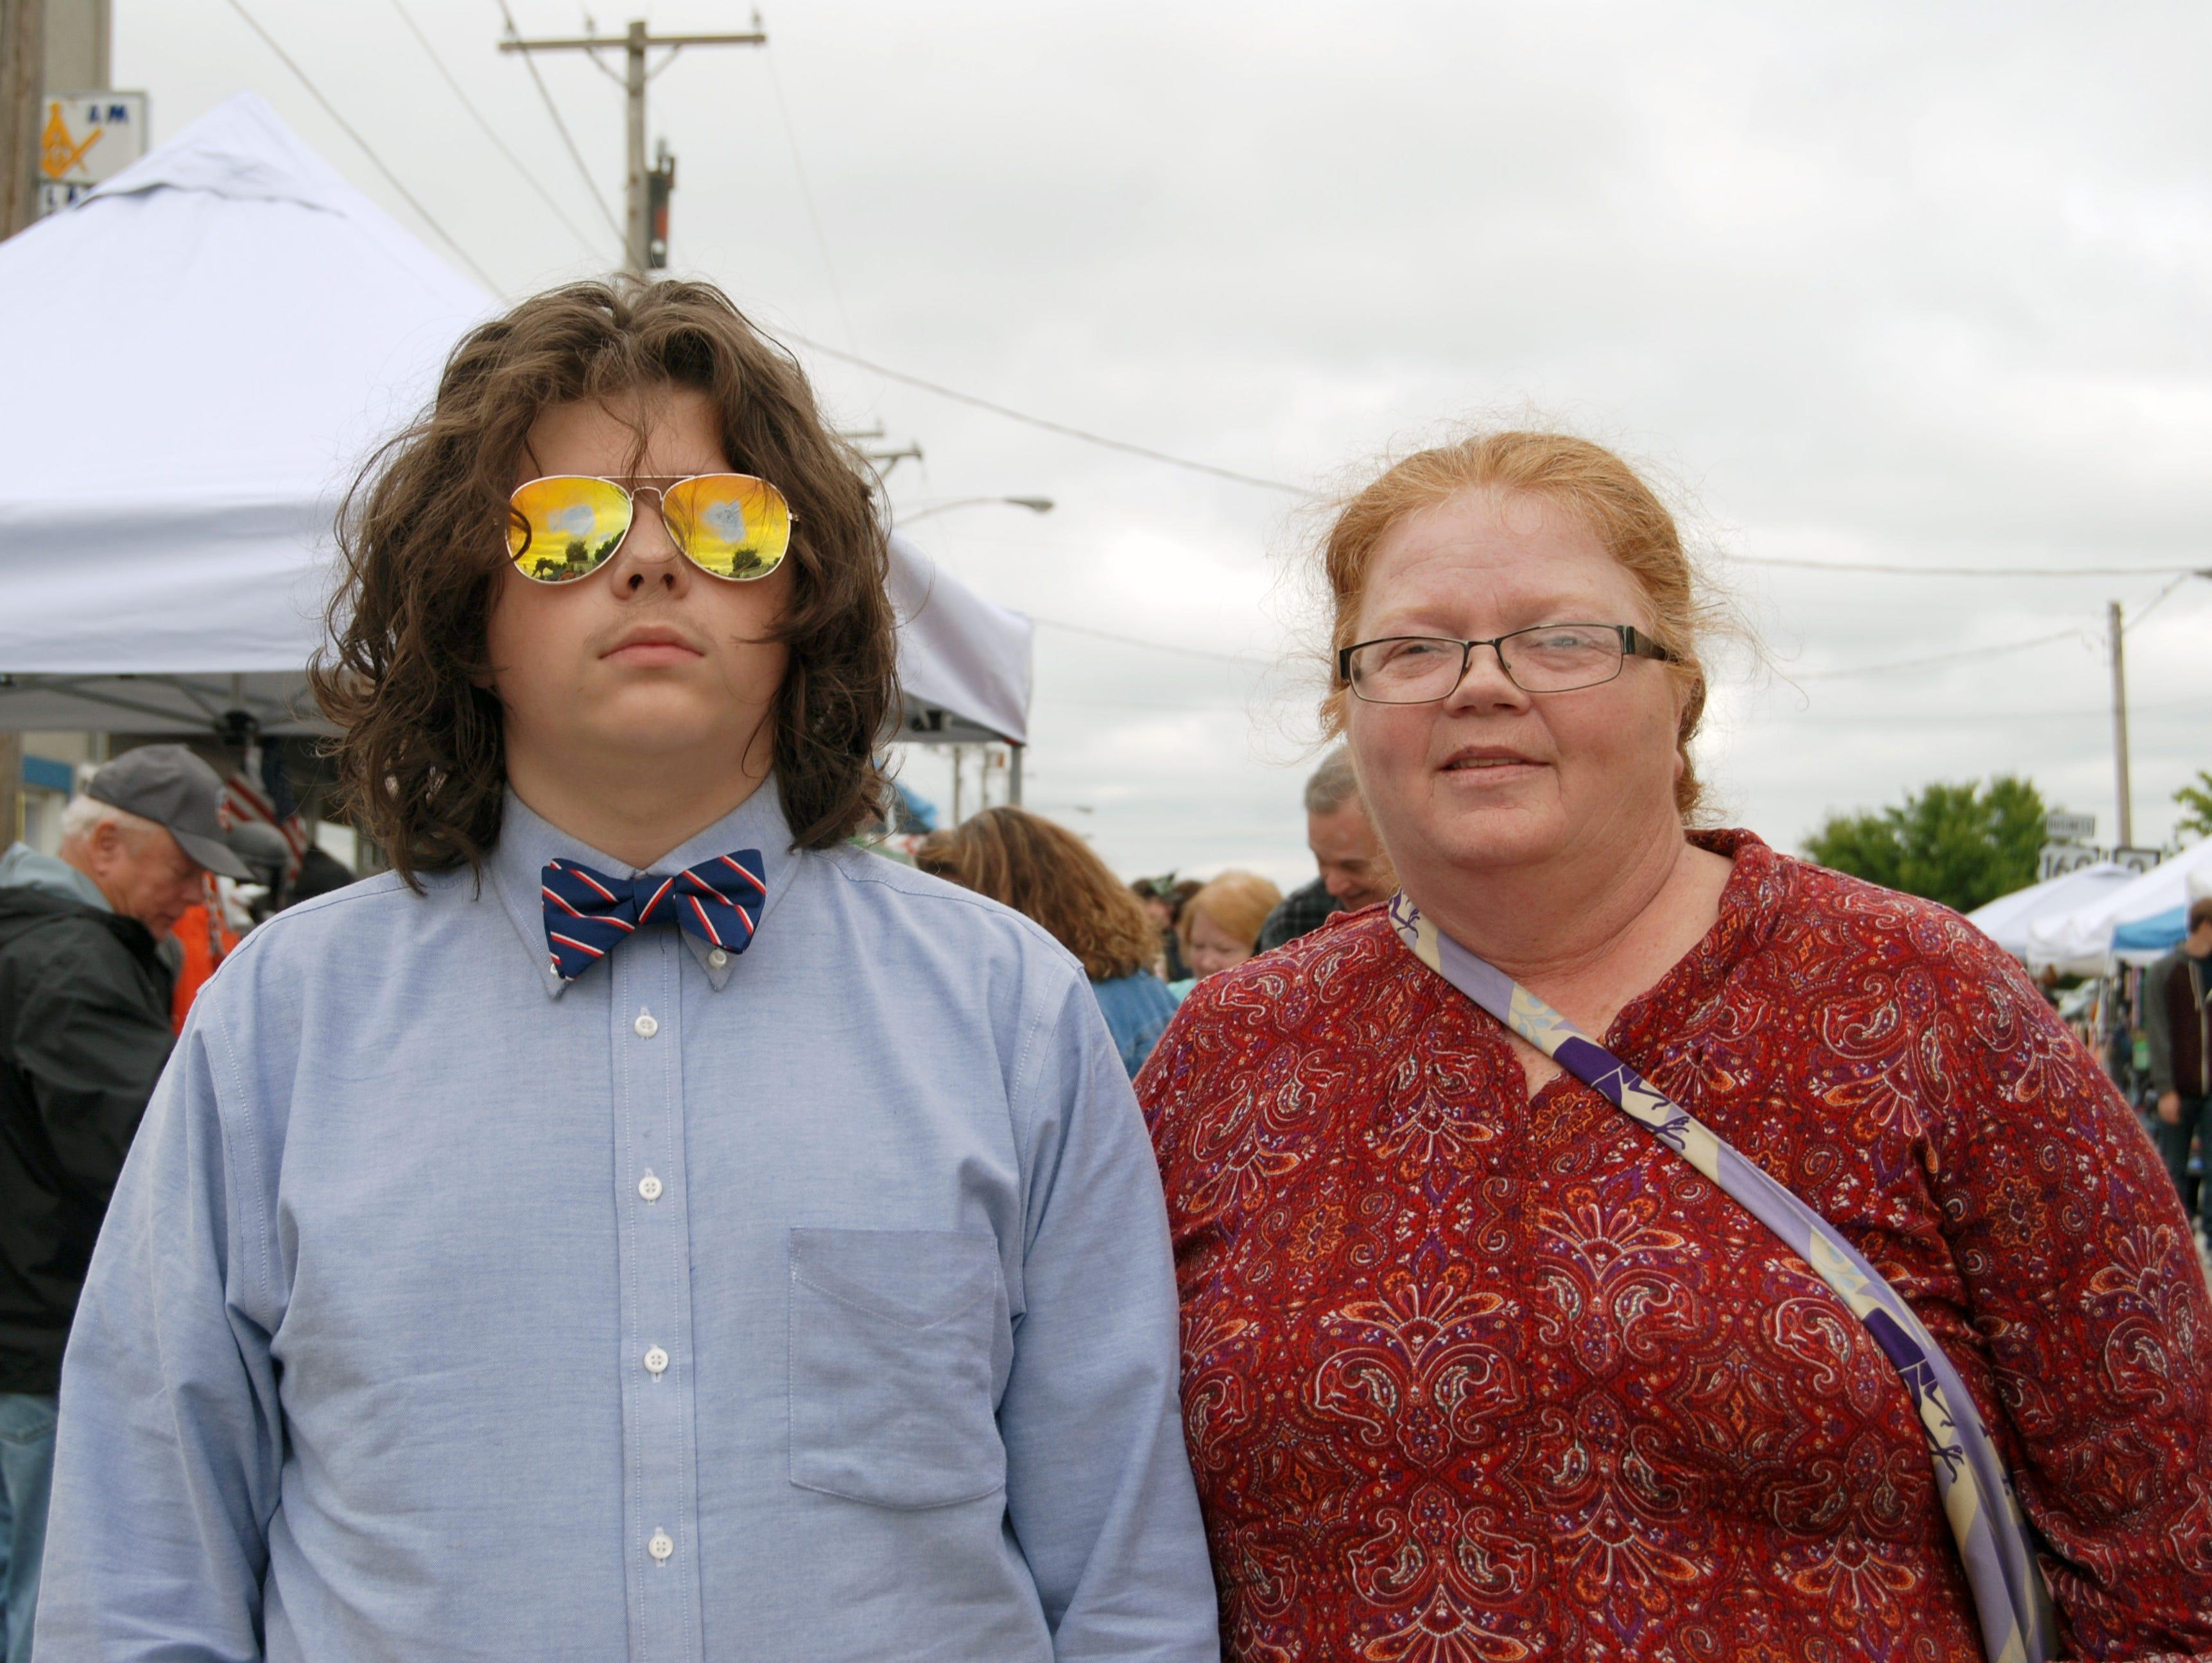 Gaston and Debbie Frey